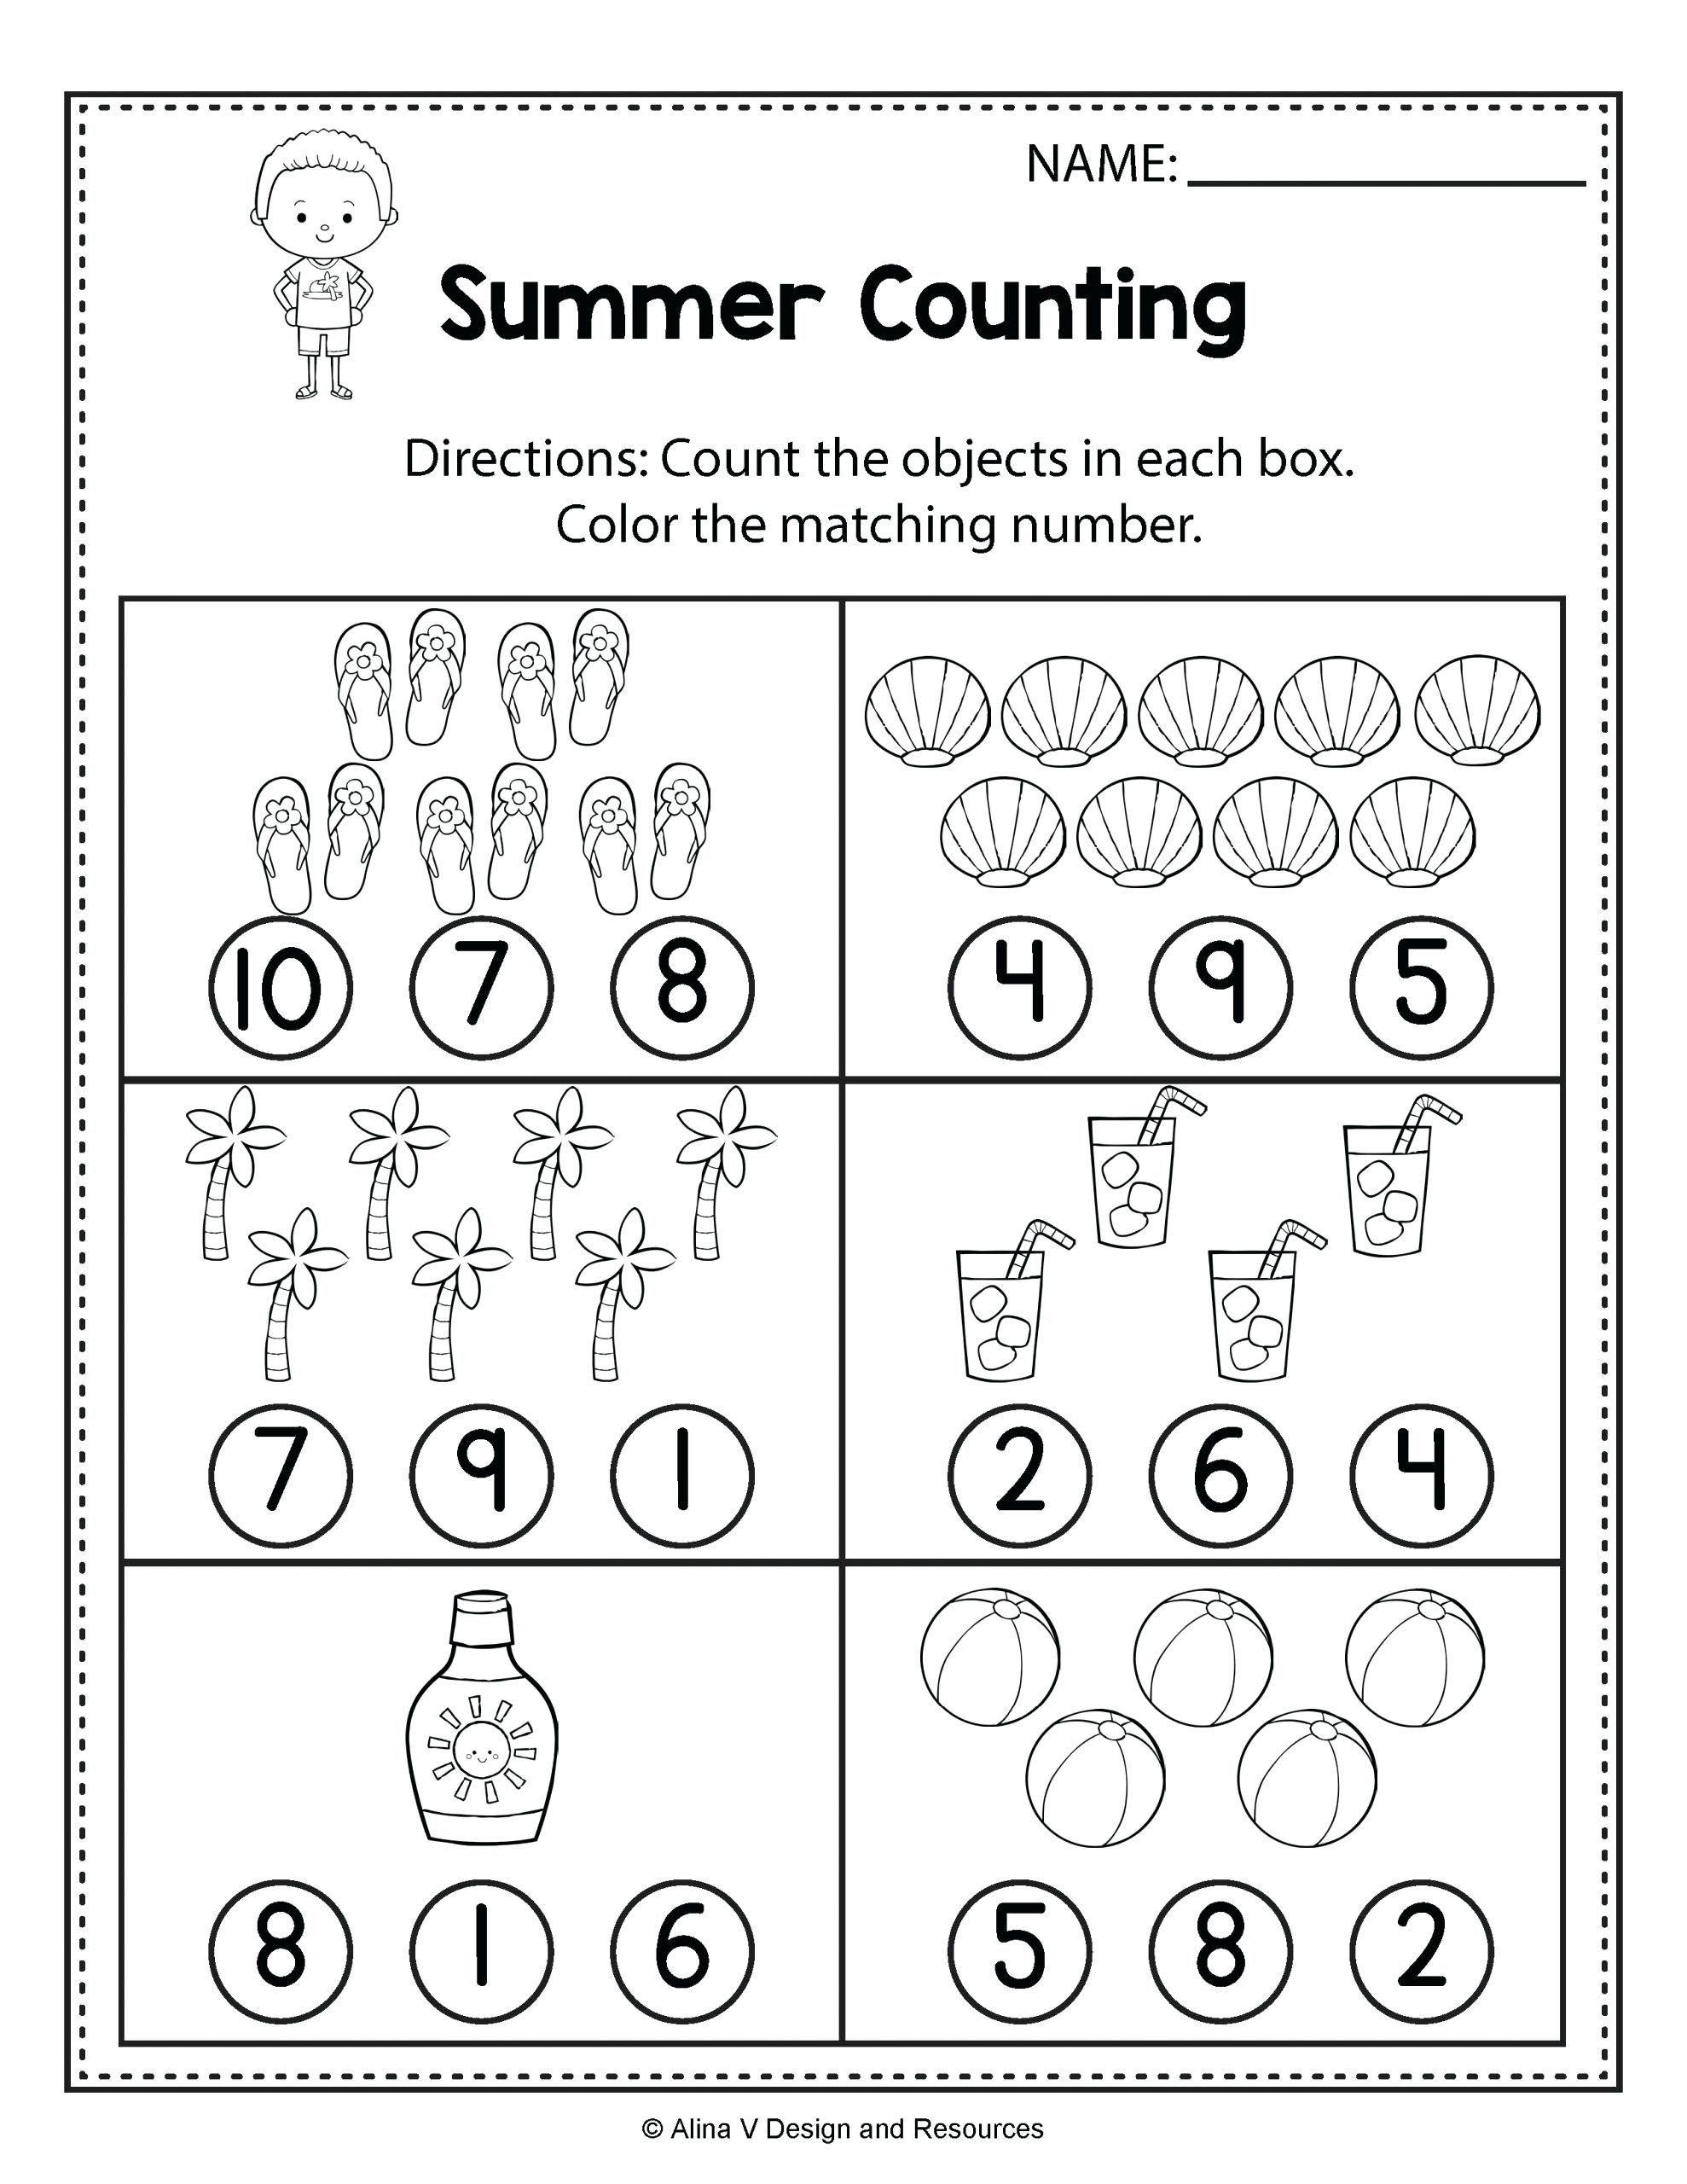 Word Problems Kindergarten Worksheets Best Of Worksheets Monthly Archives March P In 2021 Summer Math Worksheets Kindergarten Math Worksheets Printable Math Worksheets